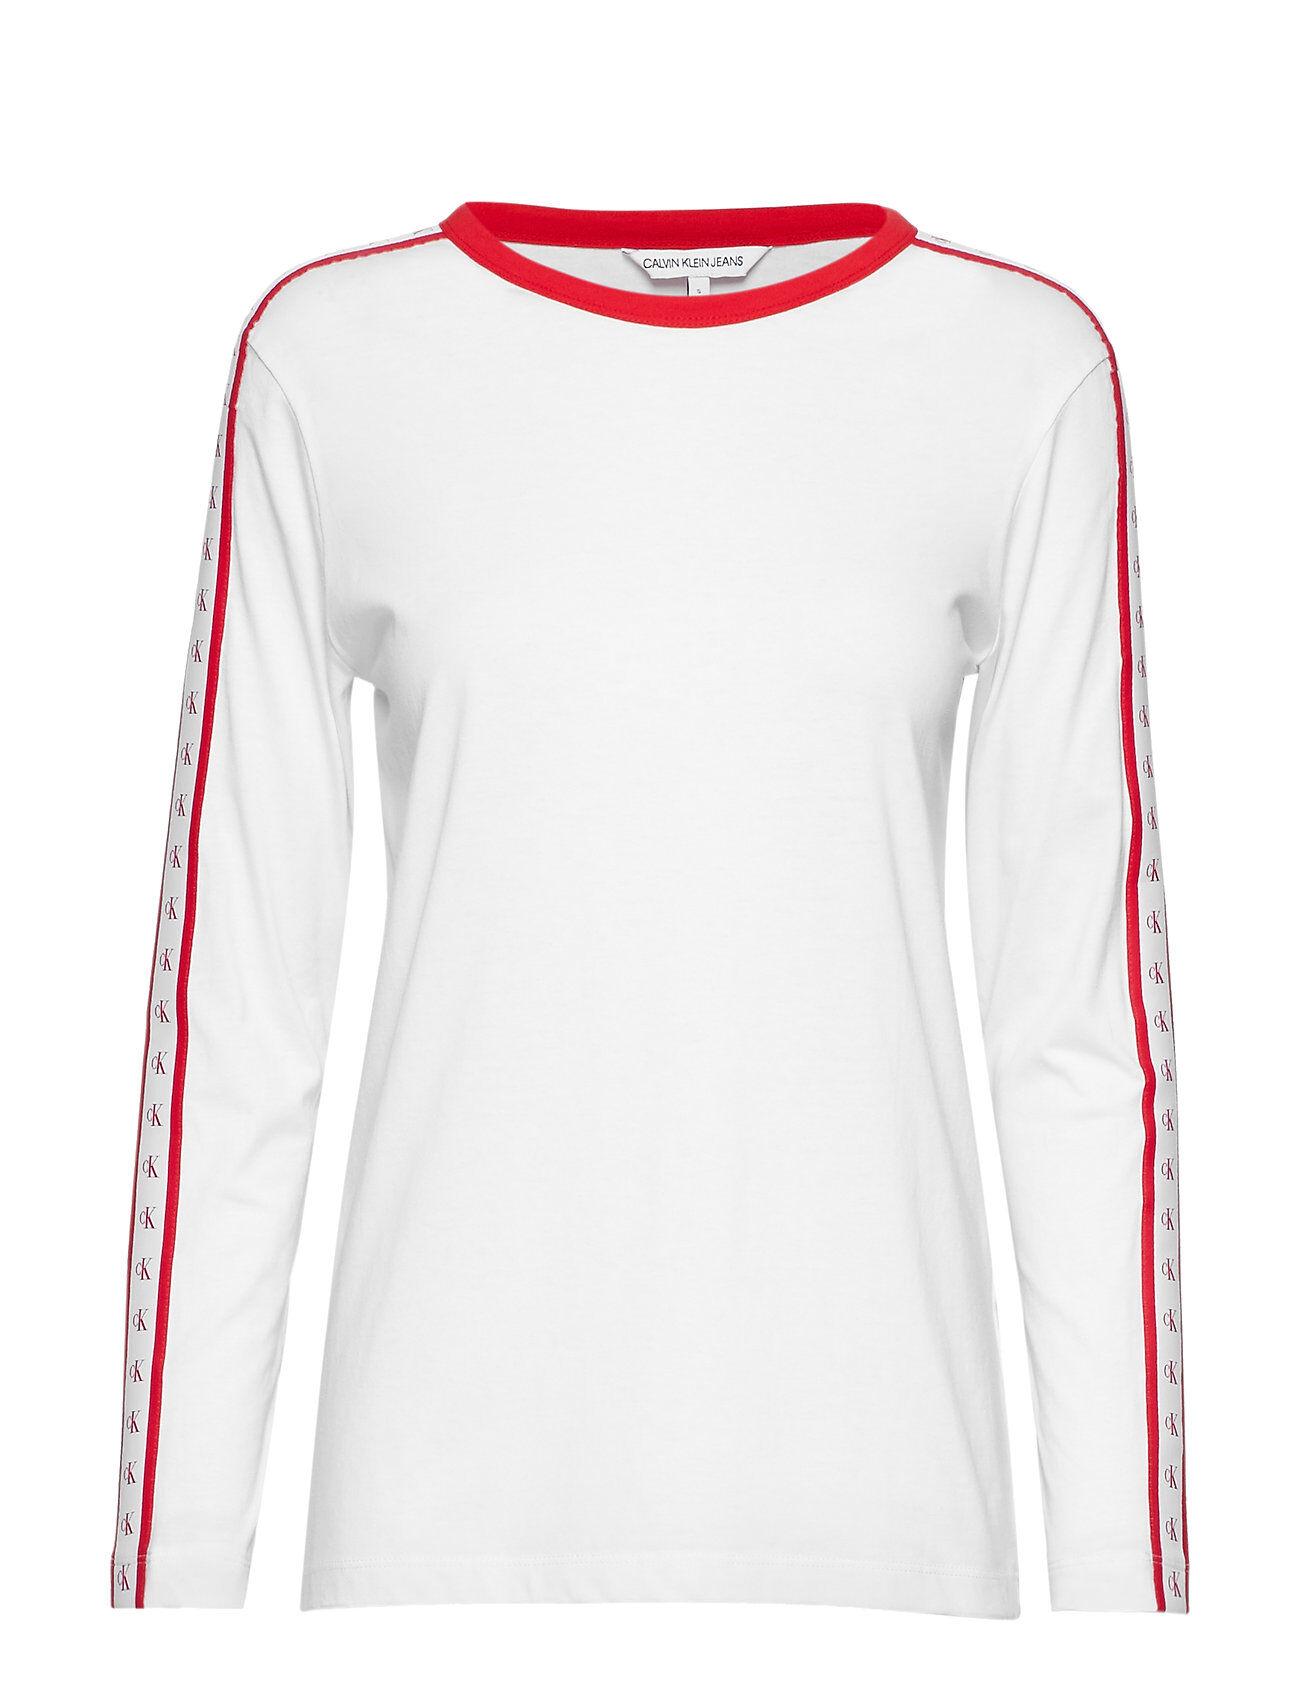 Image of Calvin Monogram Tape Straight Ls Tee T-shirts & Tops Long-sleeved Valkoinen